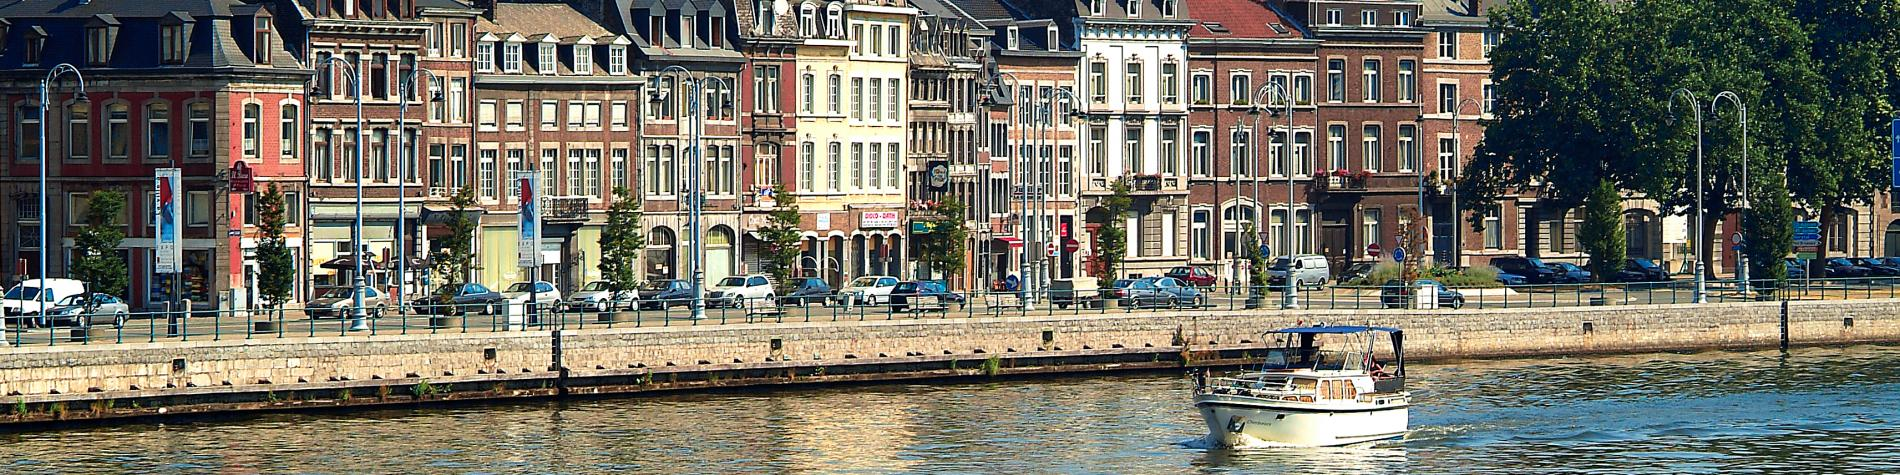 Promenade - bateaux - Liège